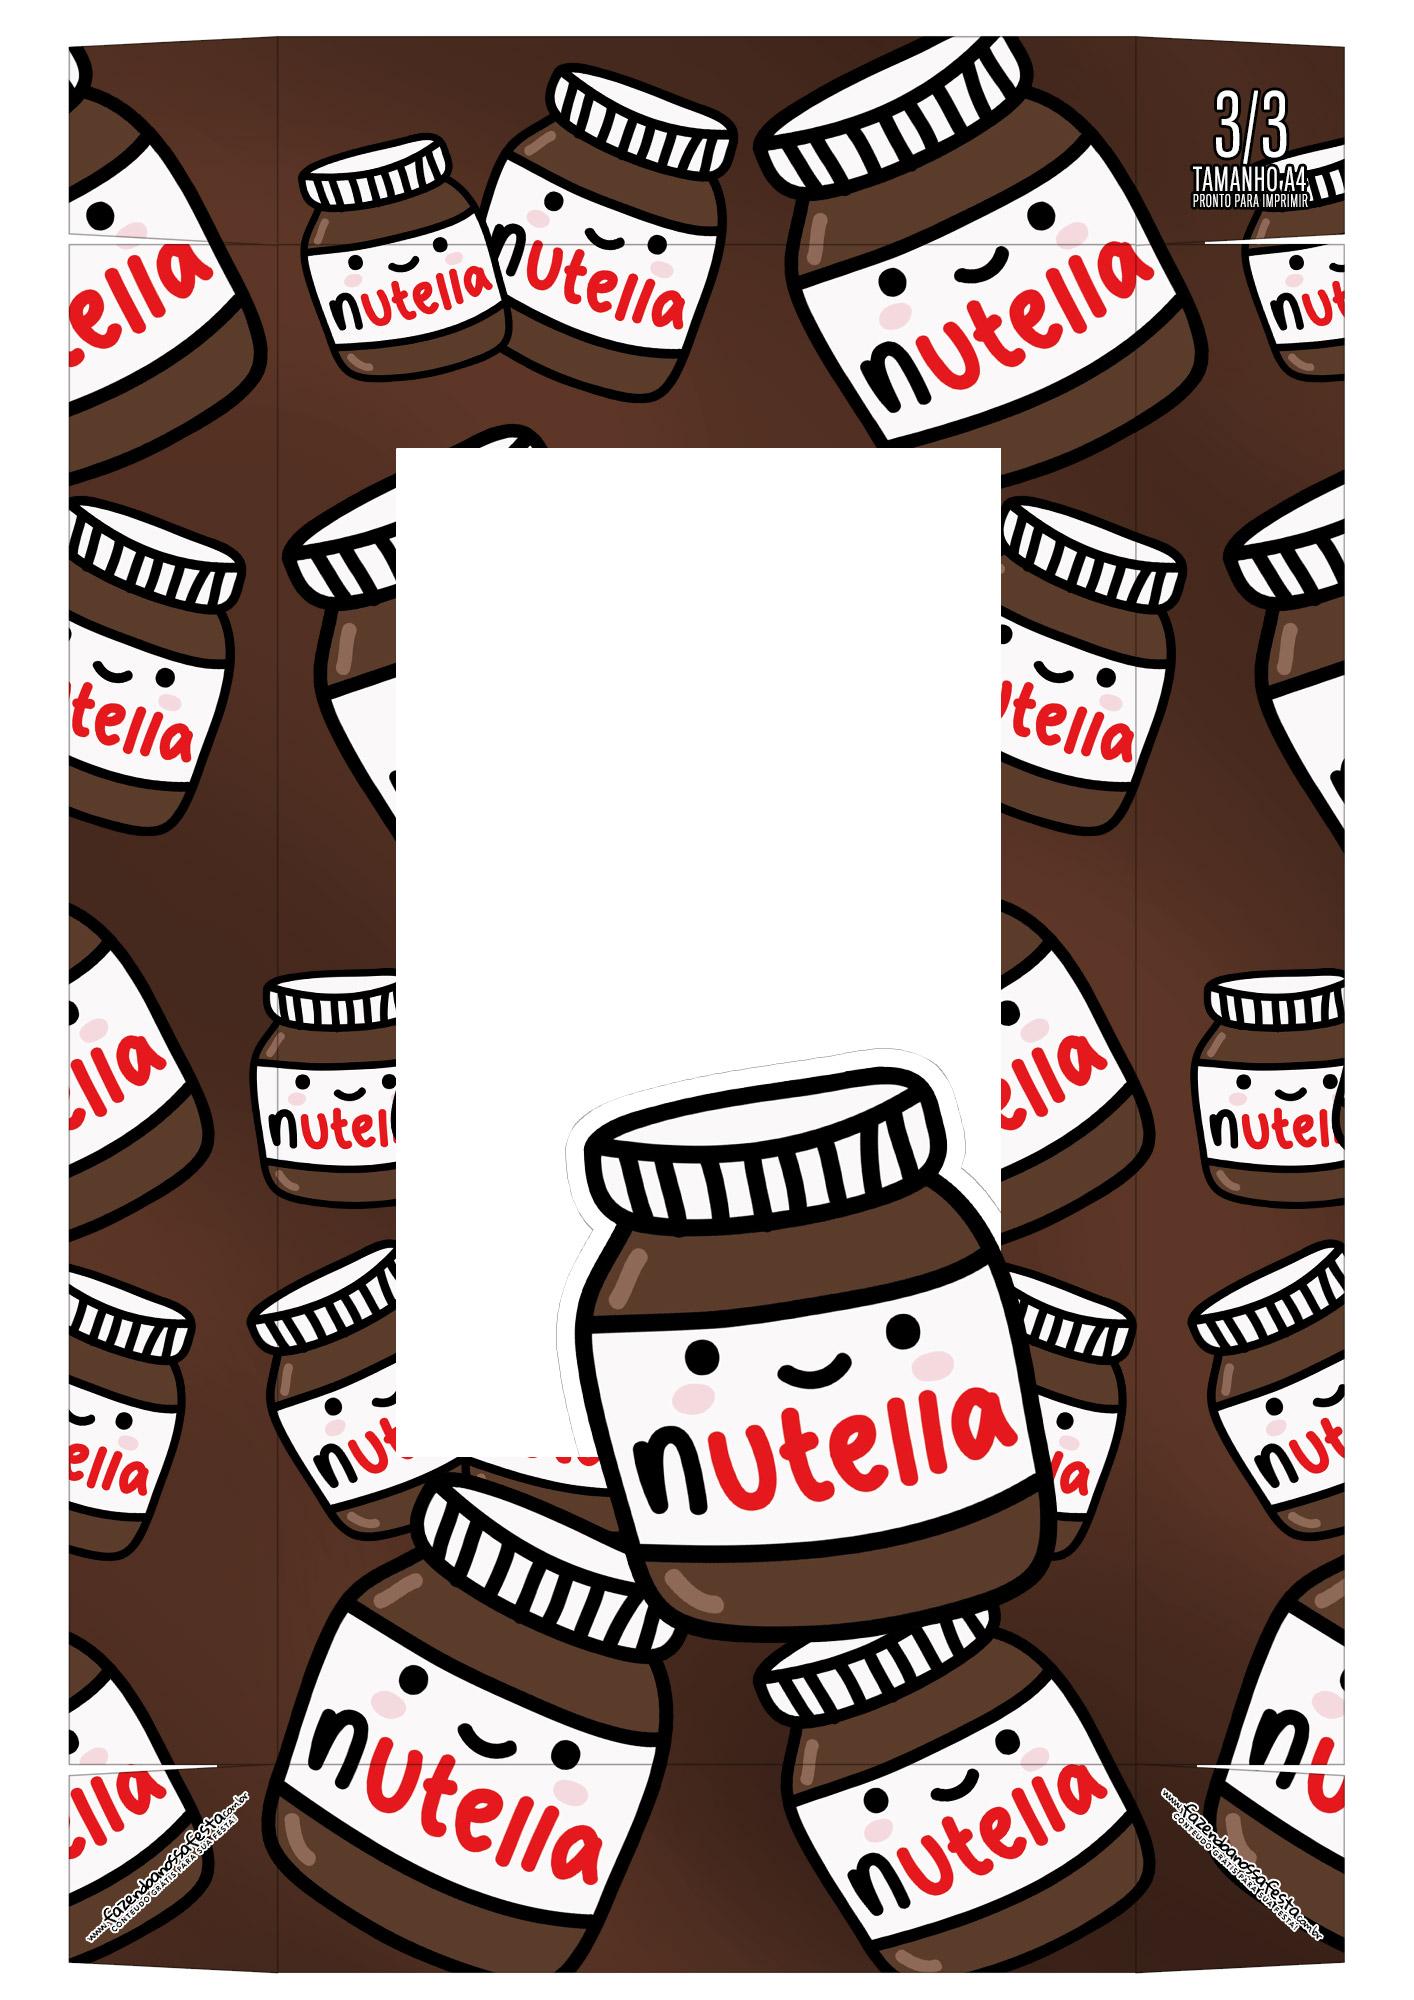 Caixa Kit Mini Confeiteiro Chocolates Nutella parte de cima 1